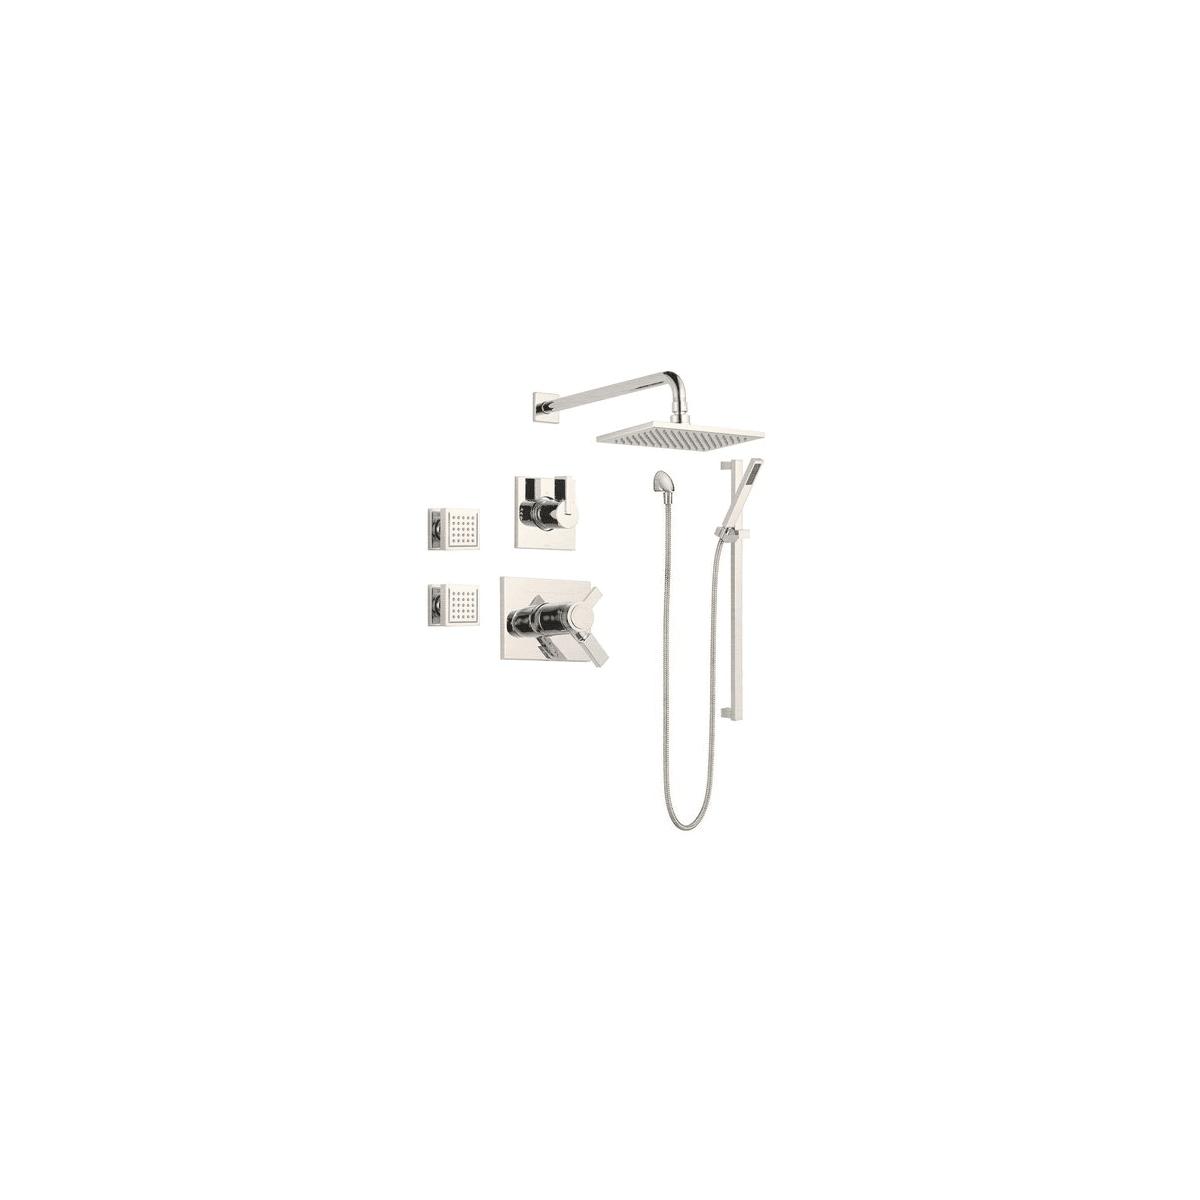 Delta Vero Monitor 17 Series Shower System